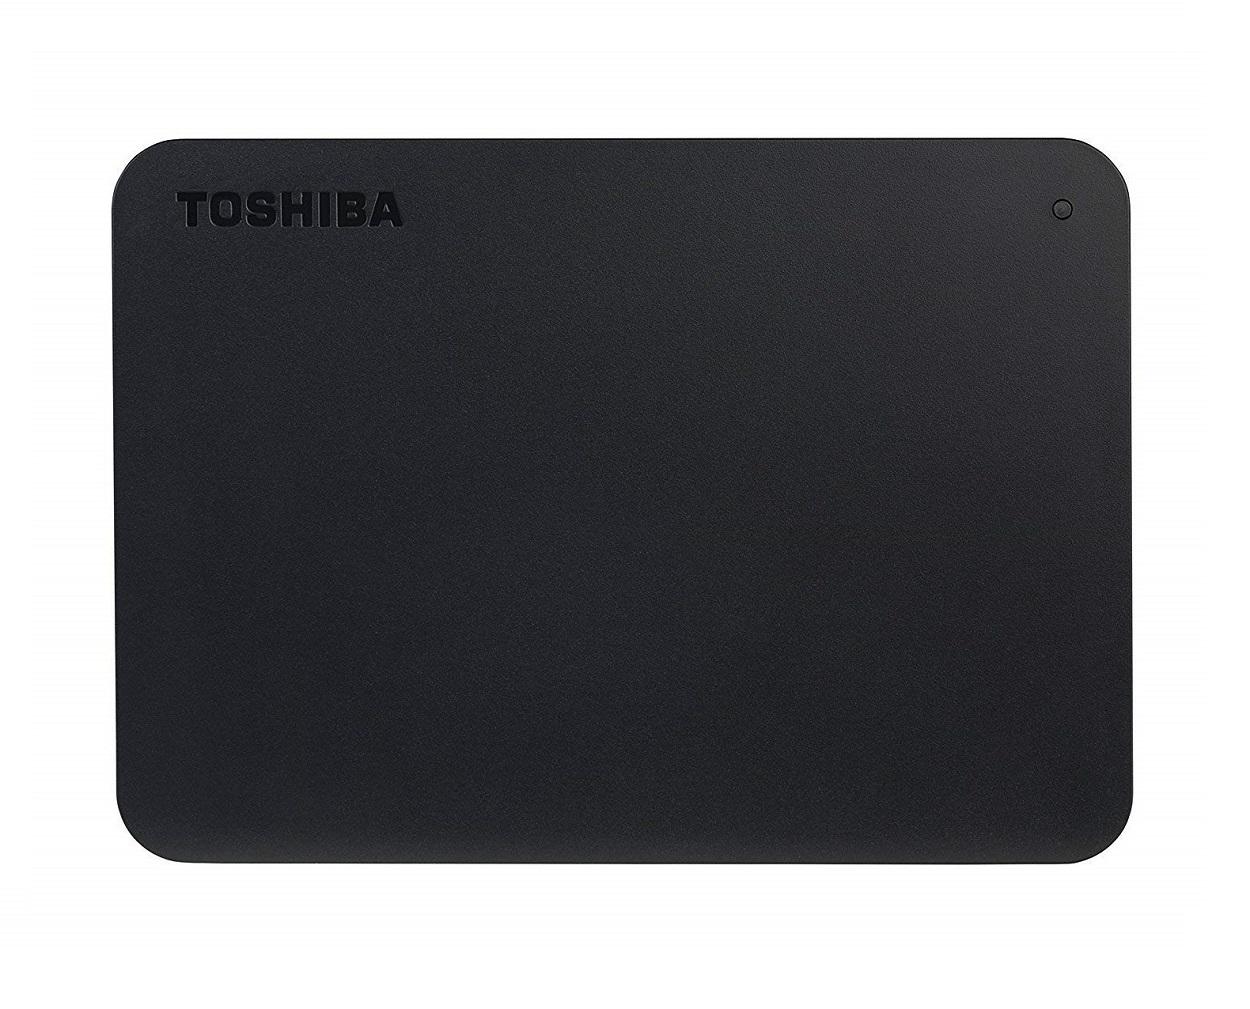 Toshiba Canvio Basics External HDD 2TB USB 3.0